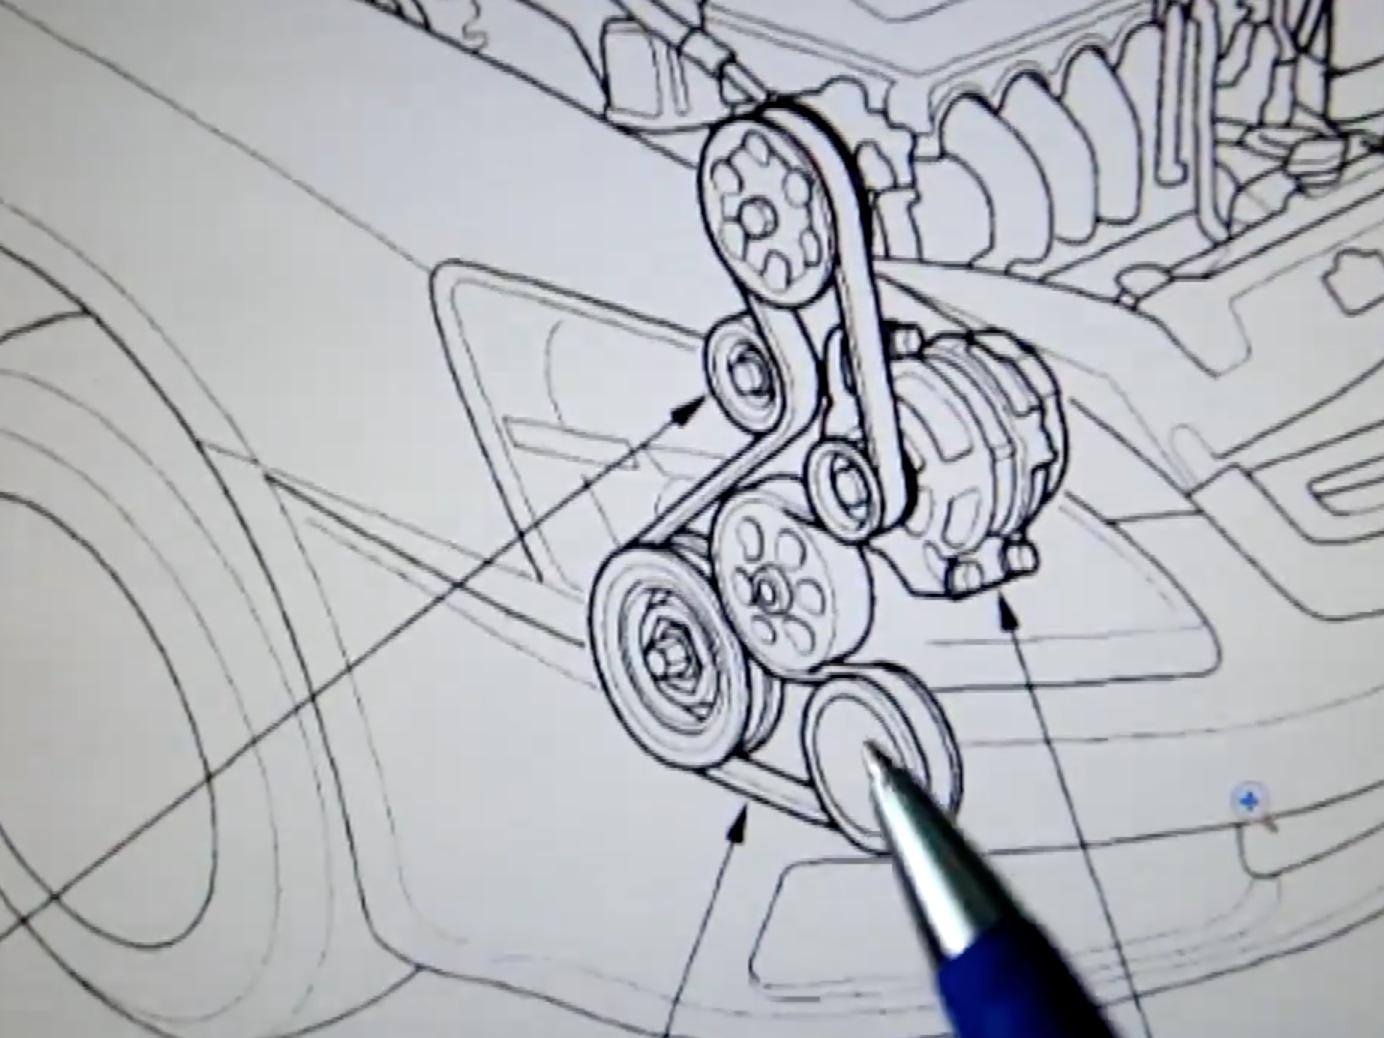 2006 Honda Accord V6 Serpentine Belt Diagram Wiring Diagrams Pilot On 2003 2007 Replacement 2005